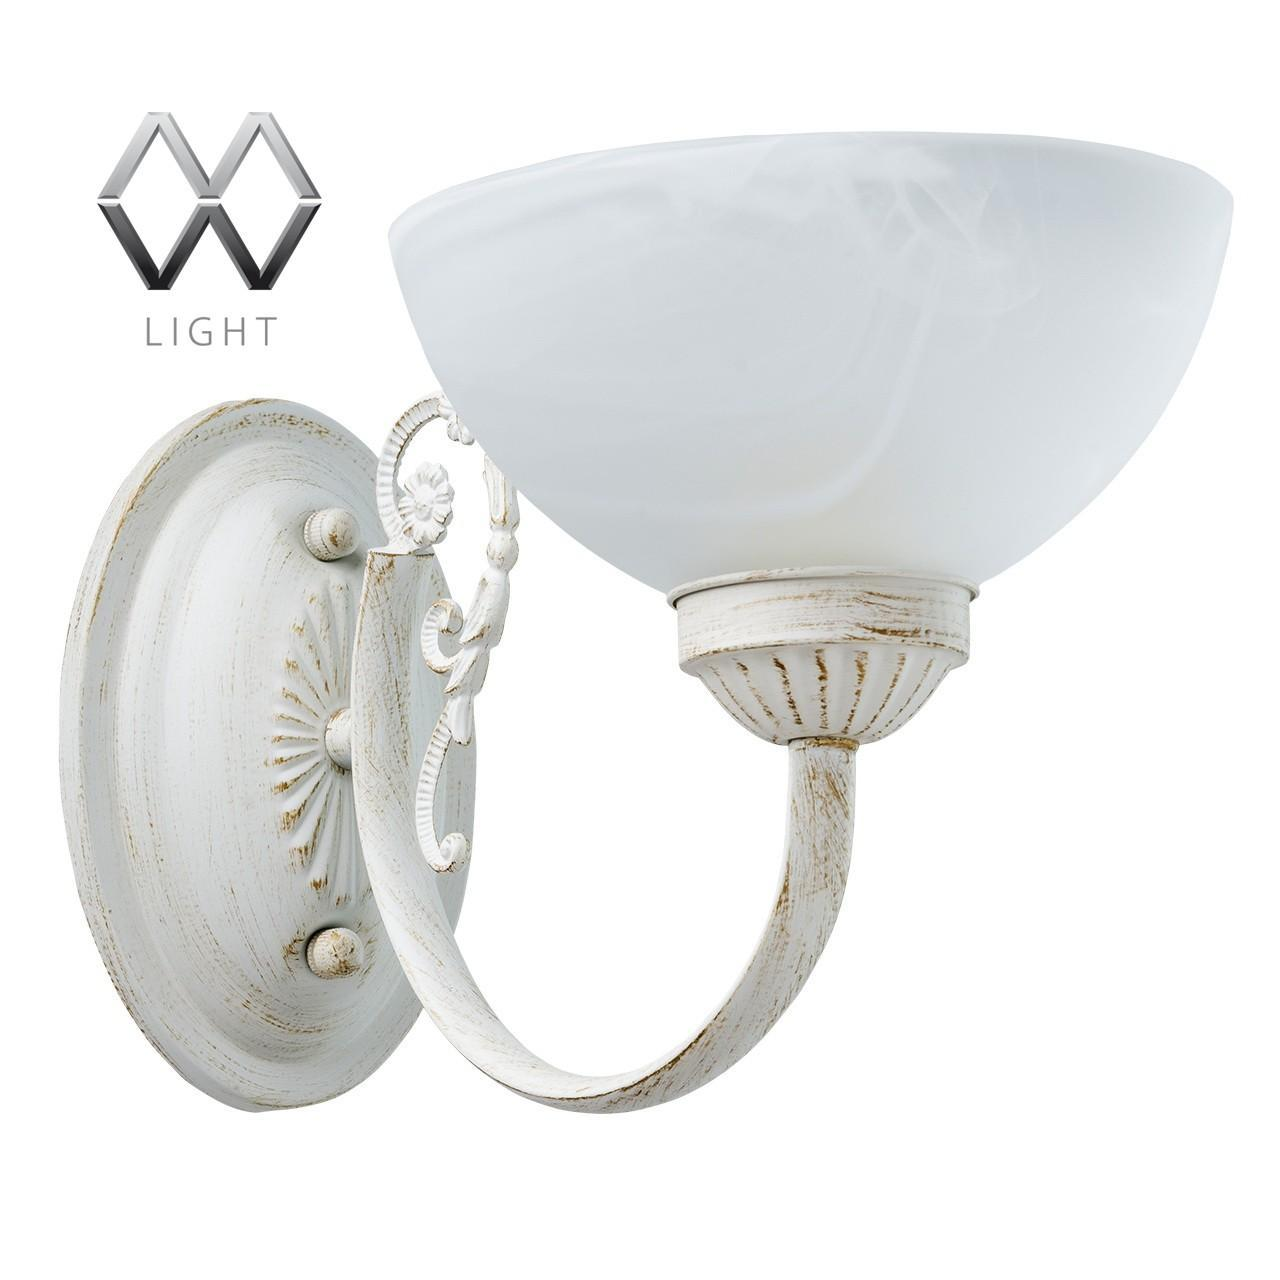 Бра MW-Light Олимп 5 318024301 бра mw light олимп 5 318024301